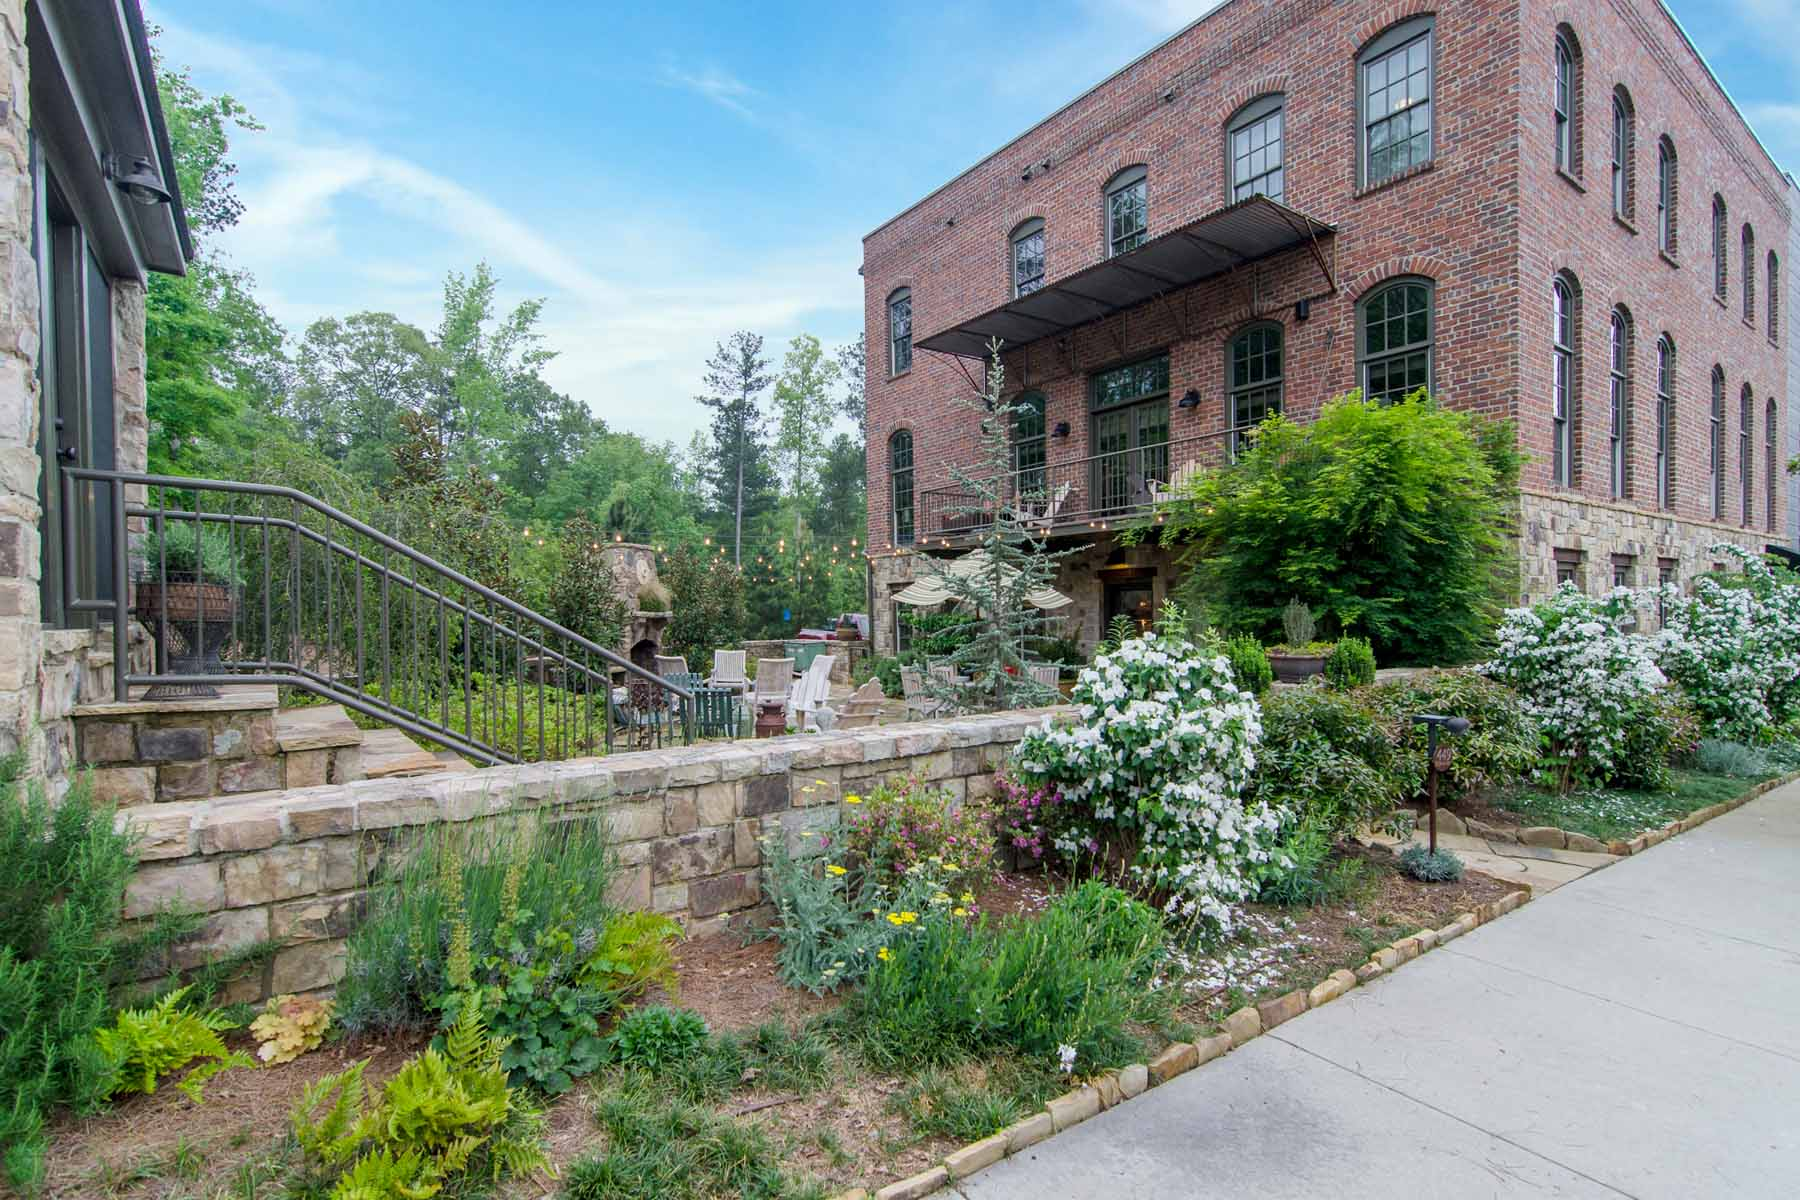 Tek Ailelik Ev için Satış at End Unit Townhome with Beautiful Private Courtyard in Serenbe 449 Selborne Lane Chattahoochee Hills, Georgia, 30268 Amerika Birleşik Devletleri